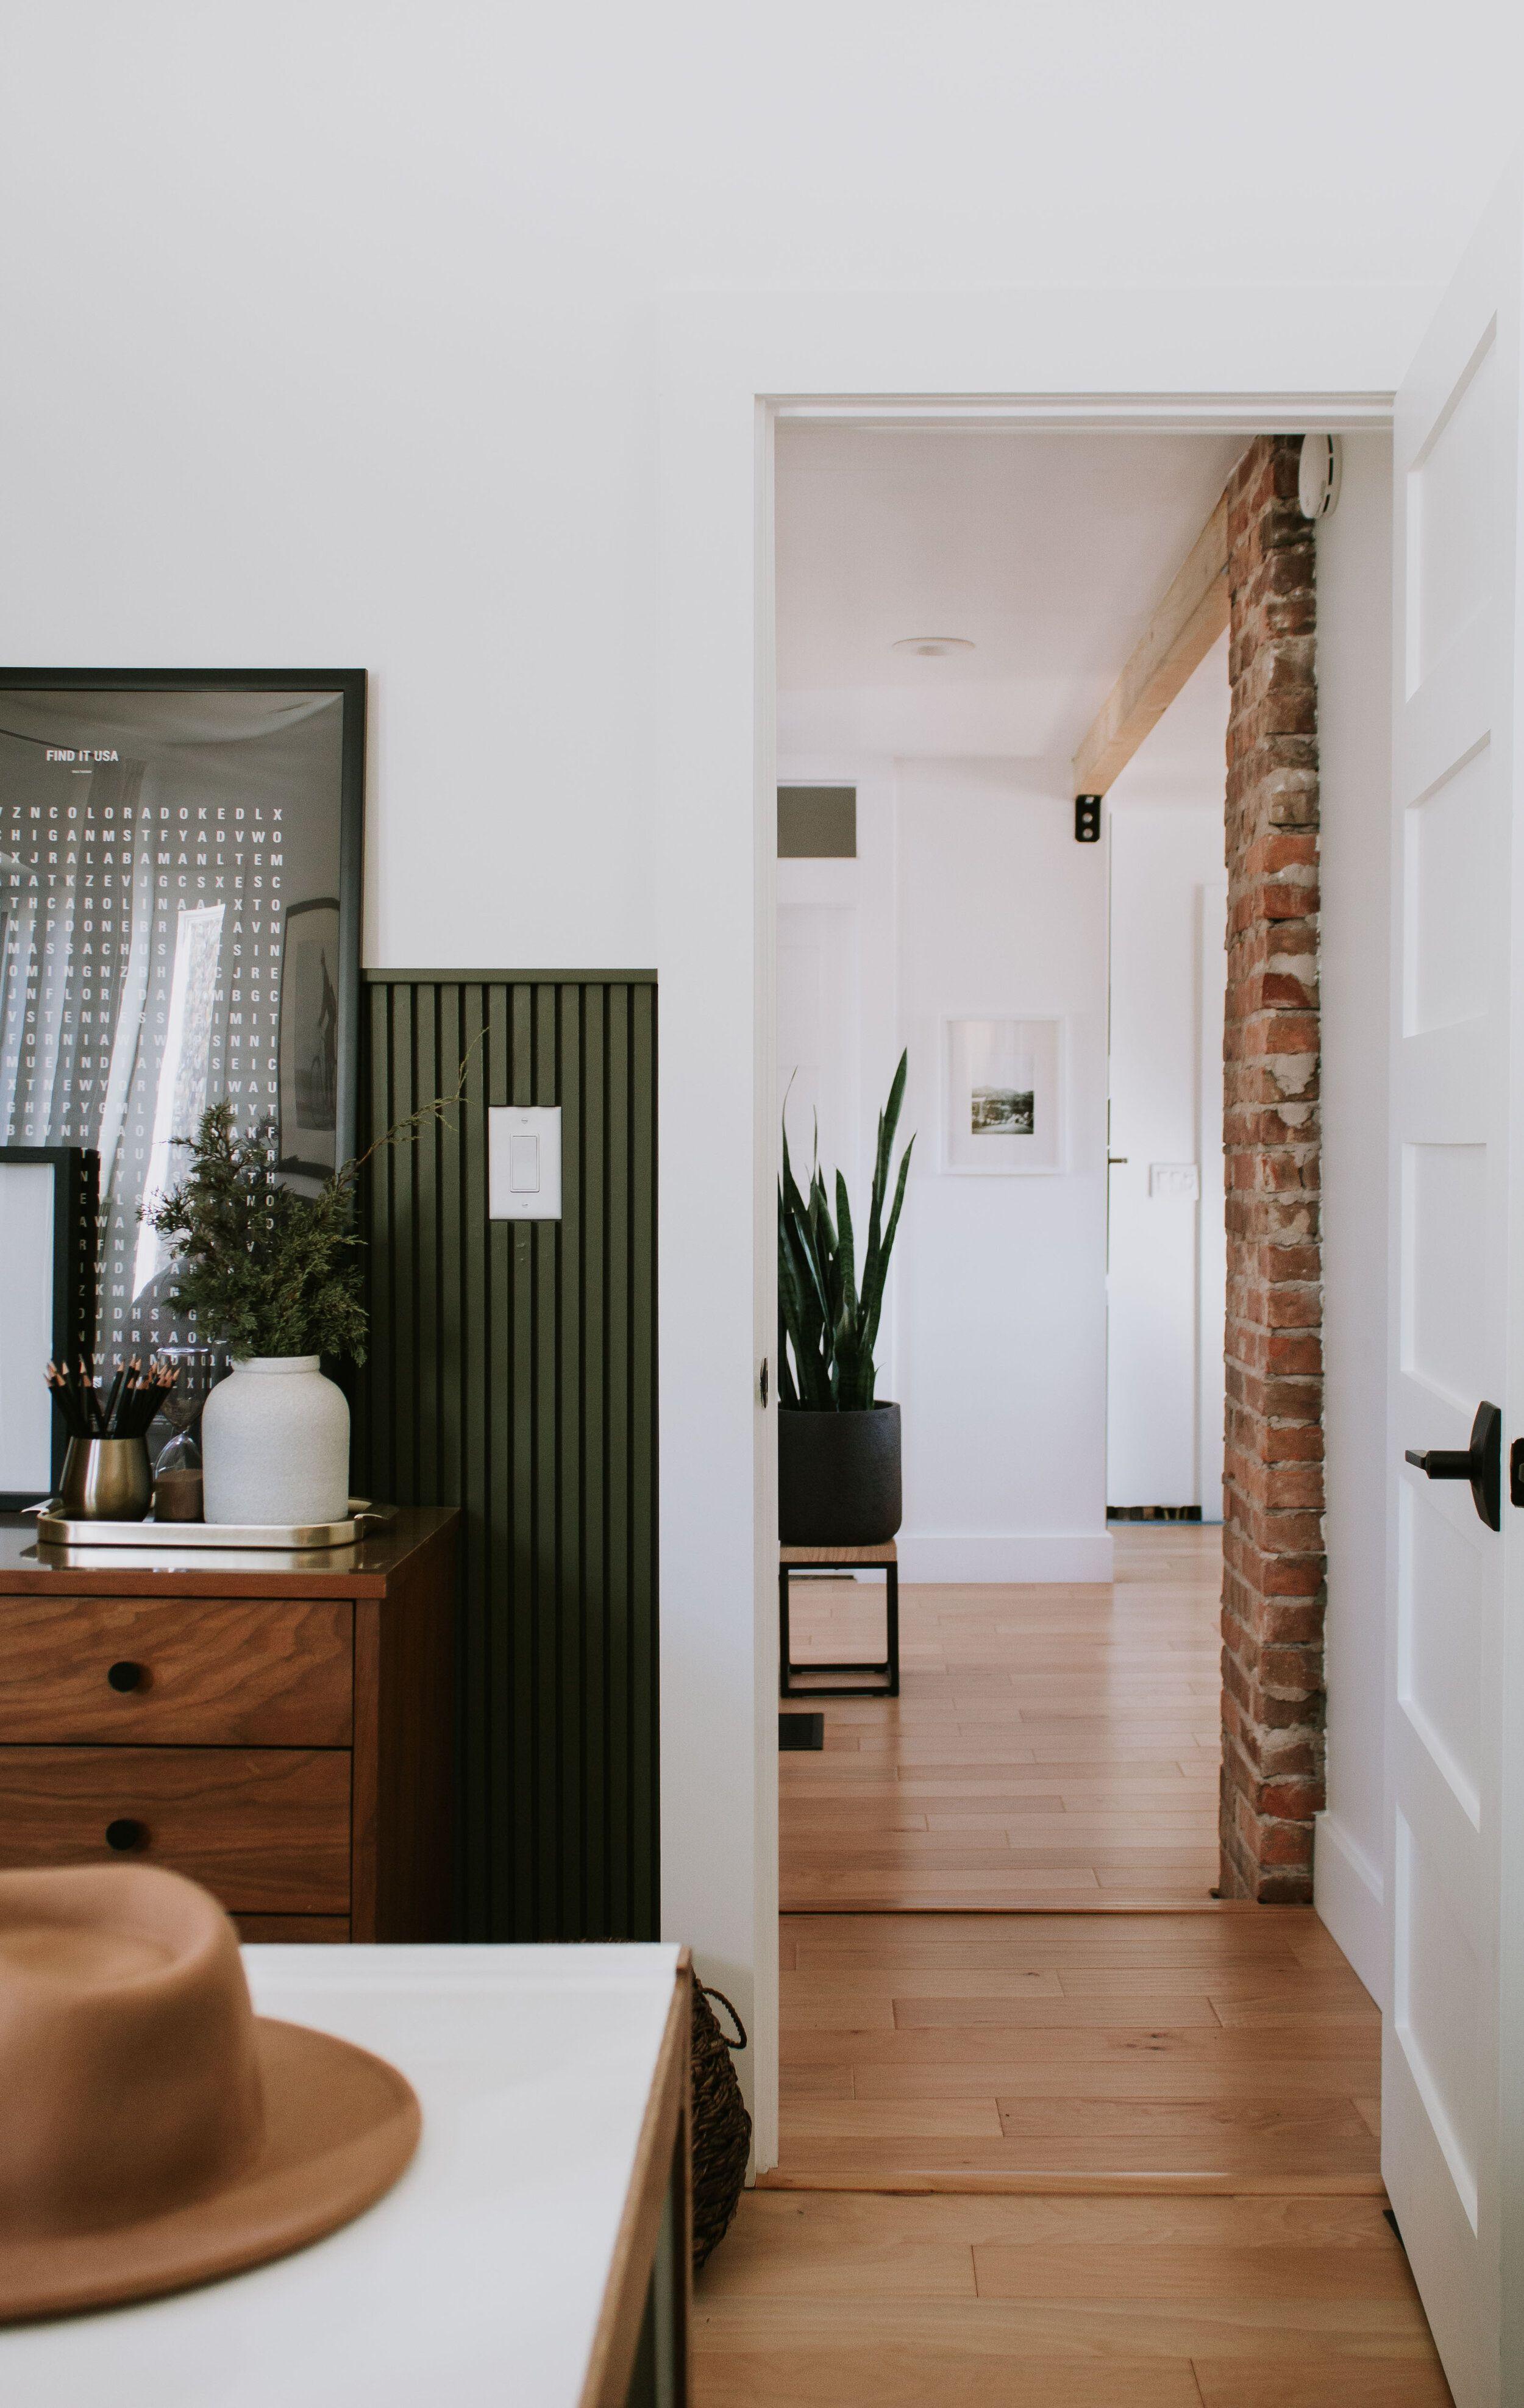 10 PLACES TO BUY WOOD FLOORS ONLINE - Flooring online stores - Shop